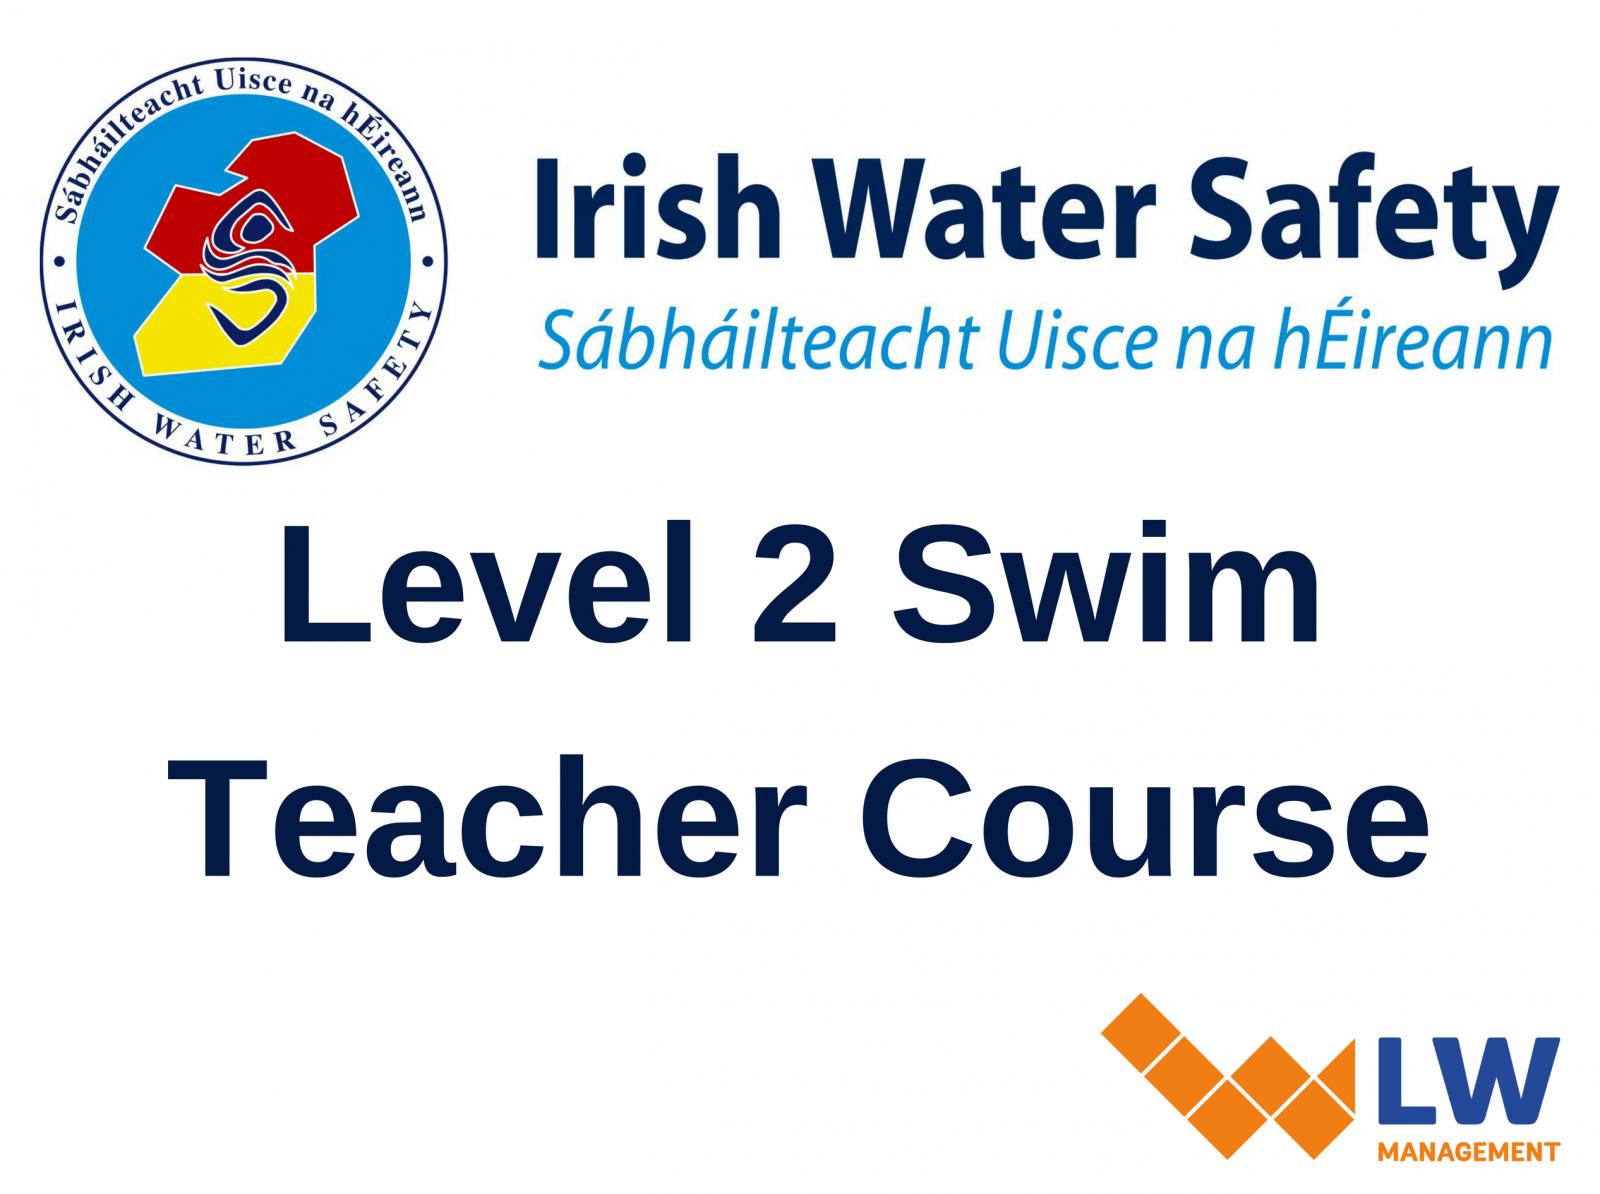 Level 2 Swim Teacher Course Lw Management